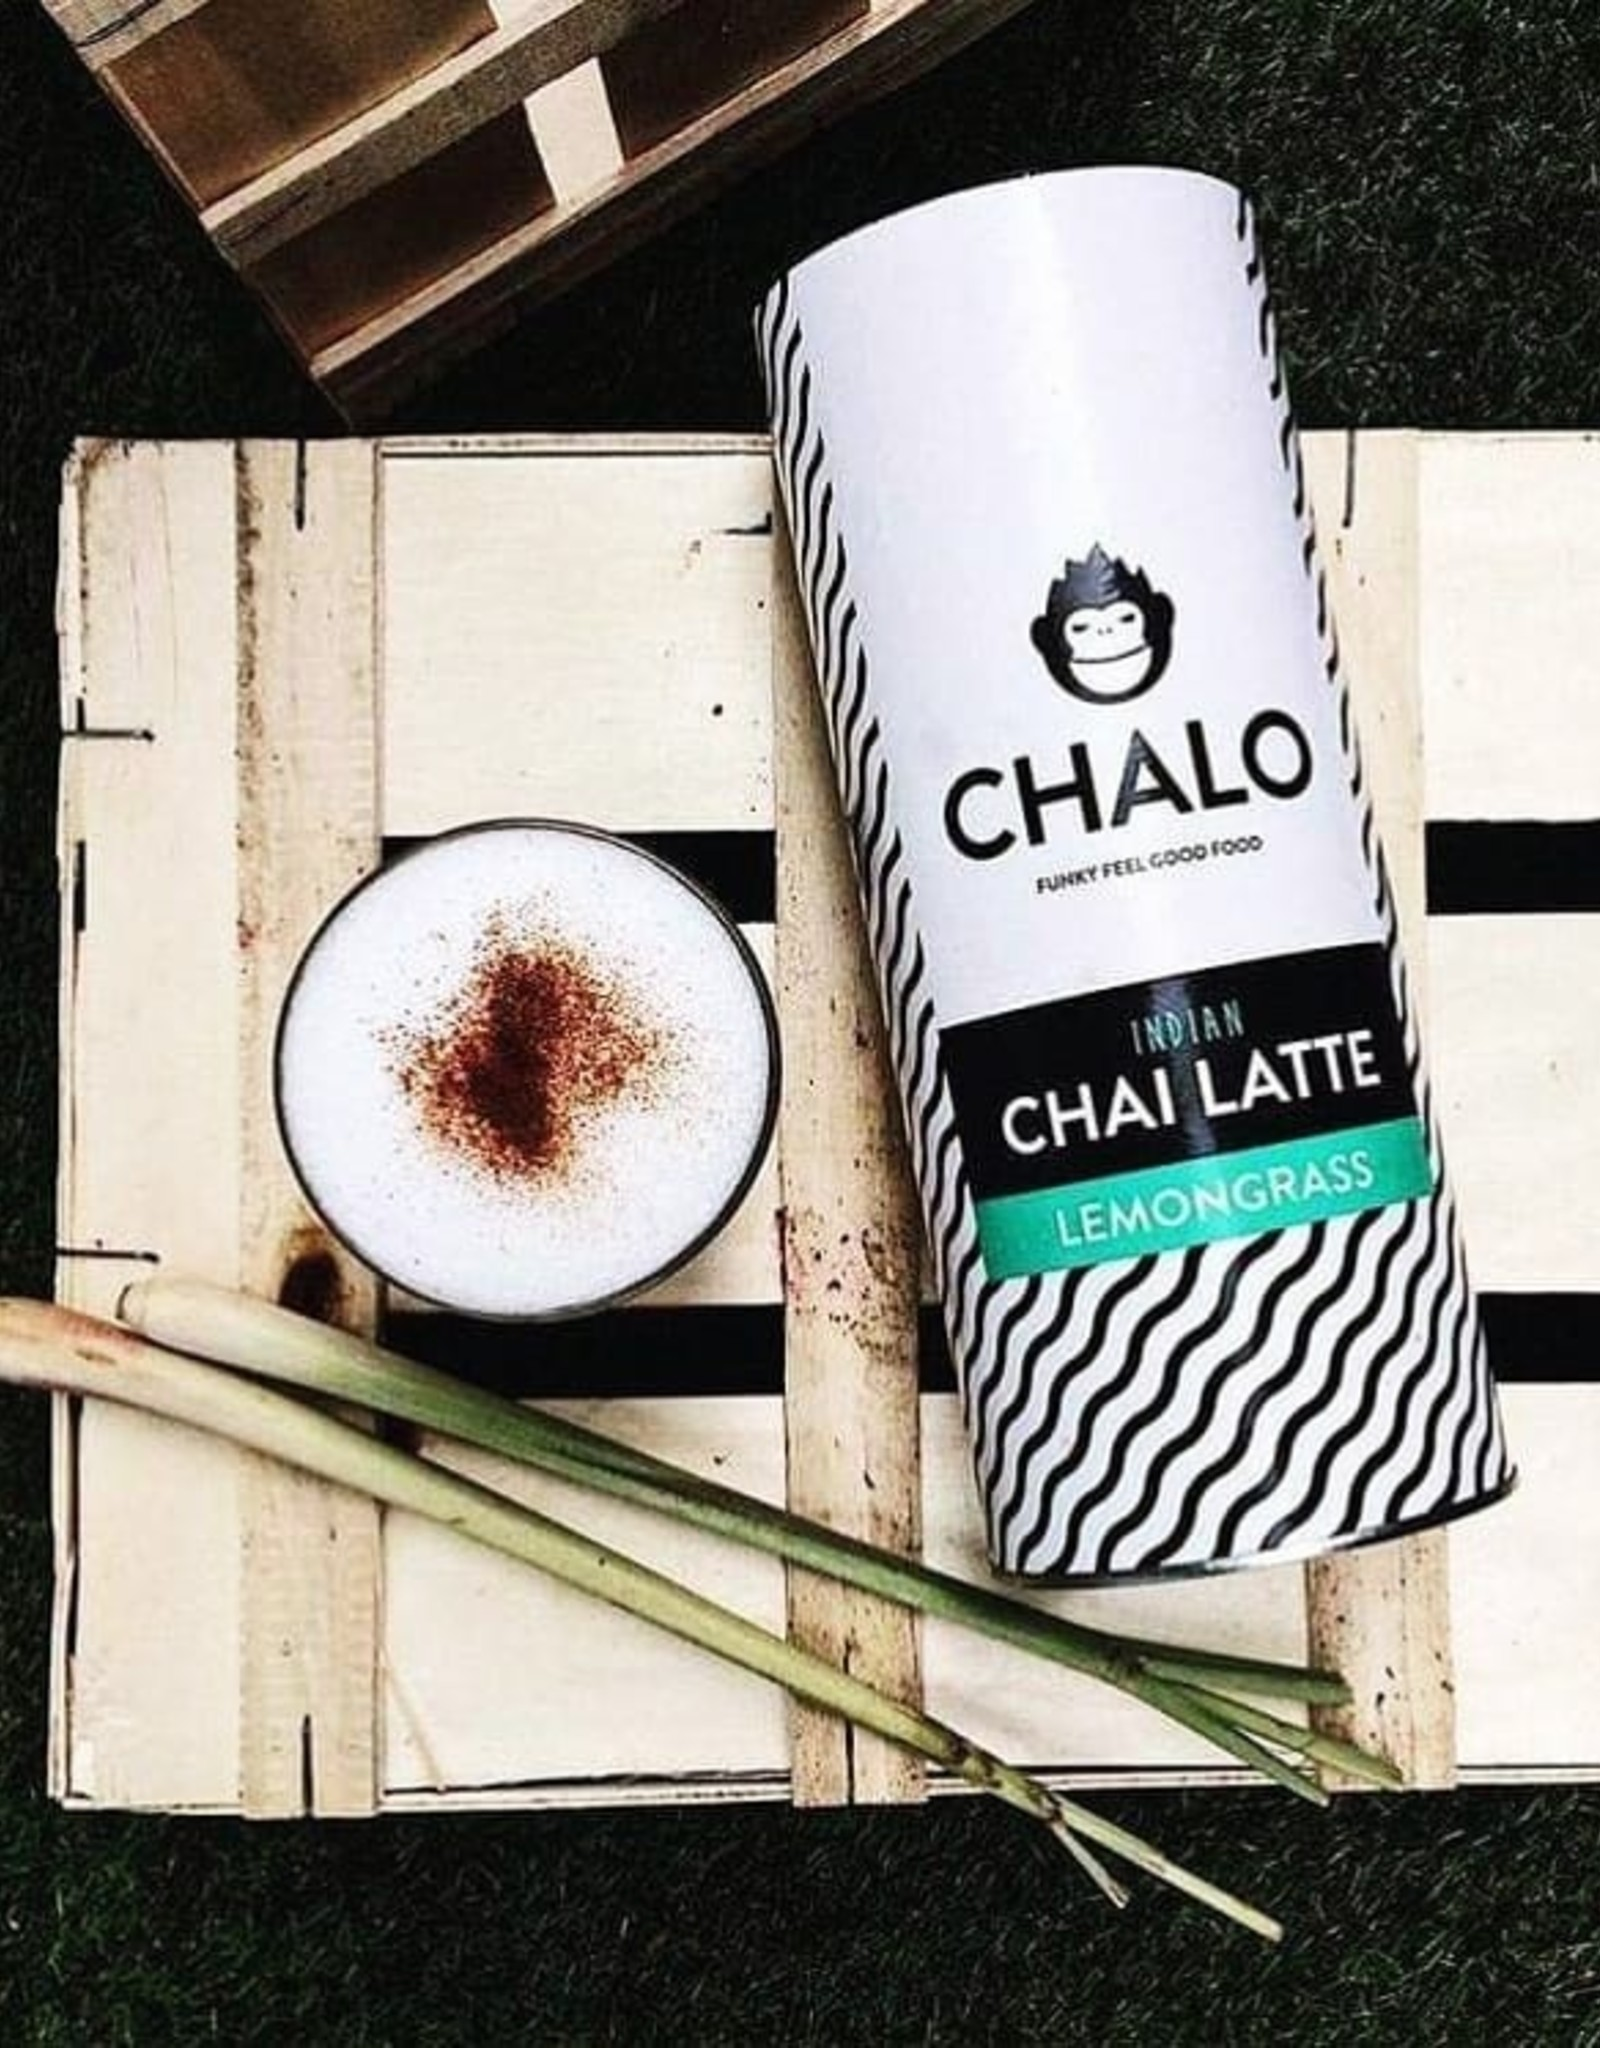 Chalo Company Lemongrass Indian Chai Latte